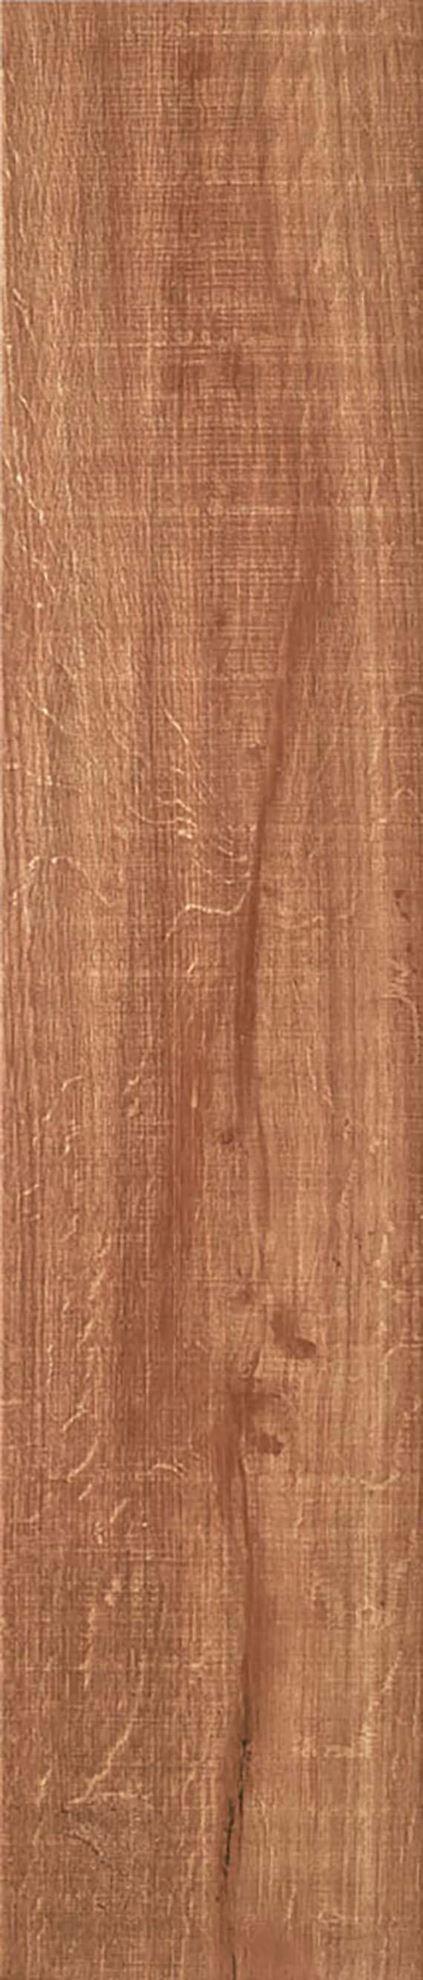 WOOD HAVAN 15x70